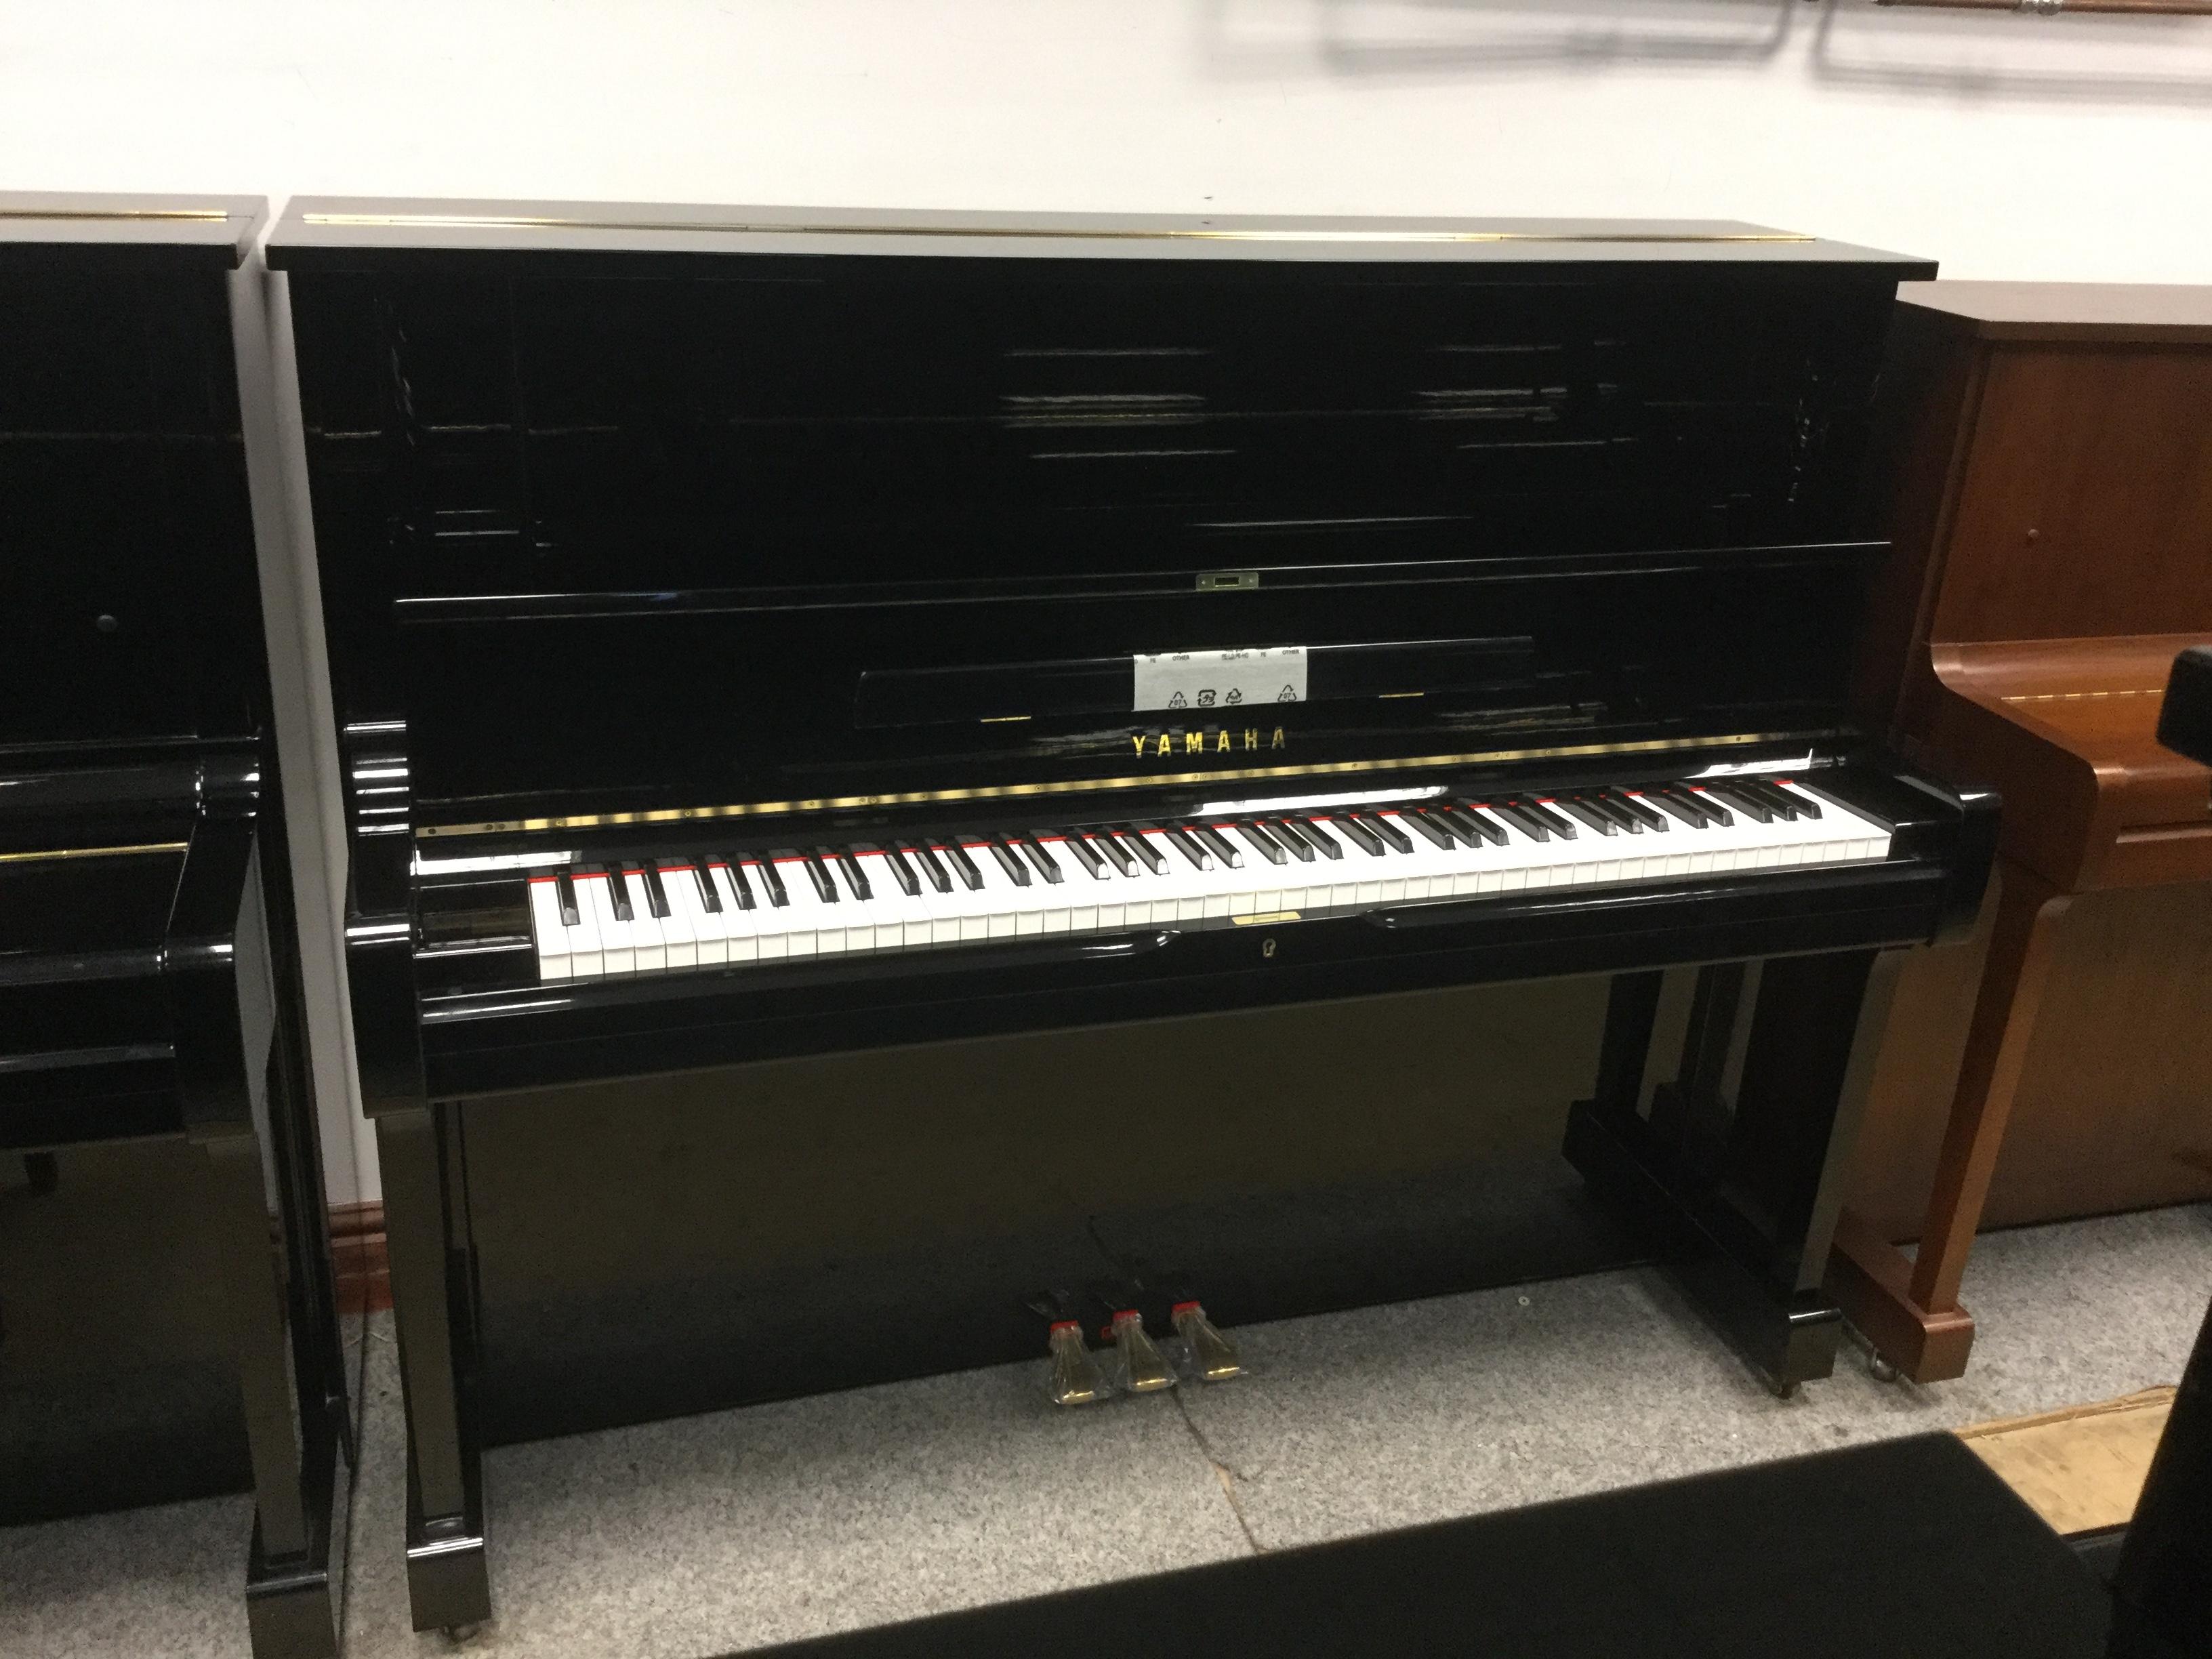 Yamaha yus j reid pianos london for Yamaha pianos tampa